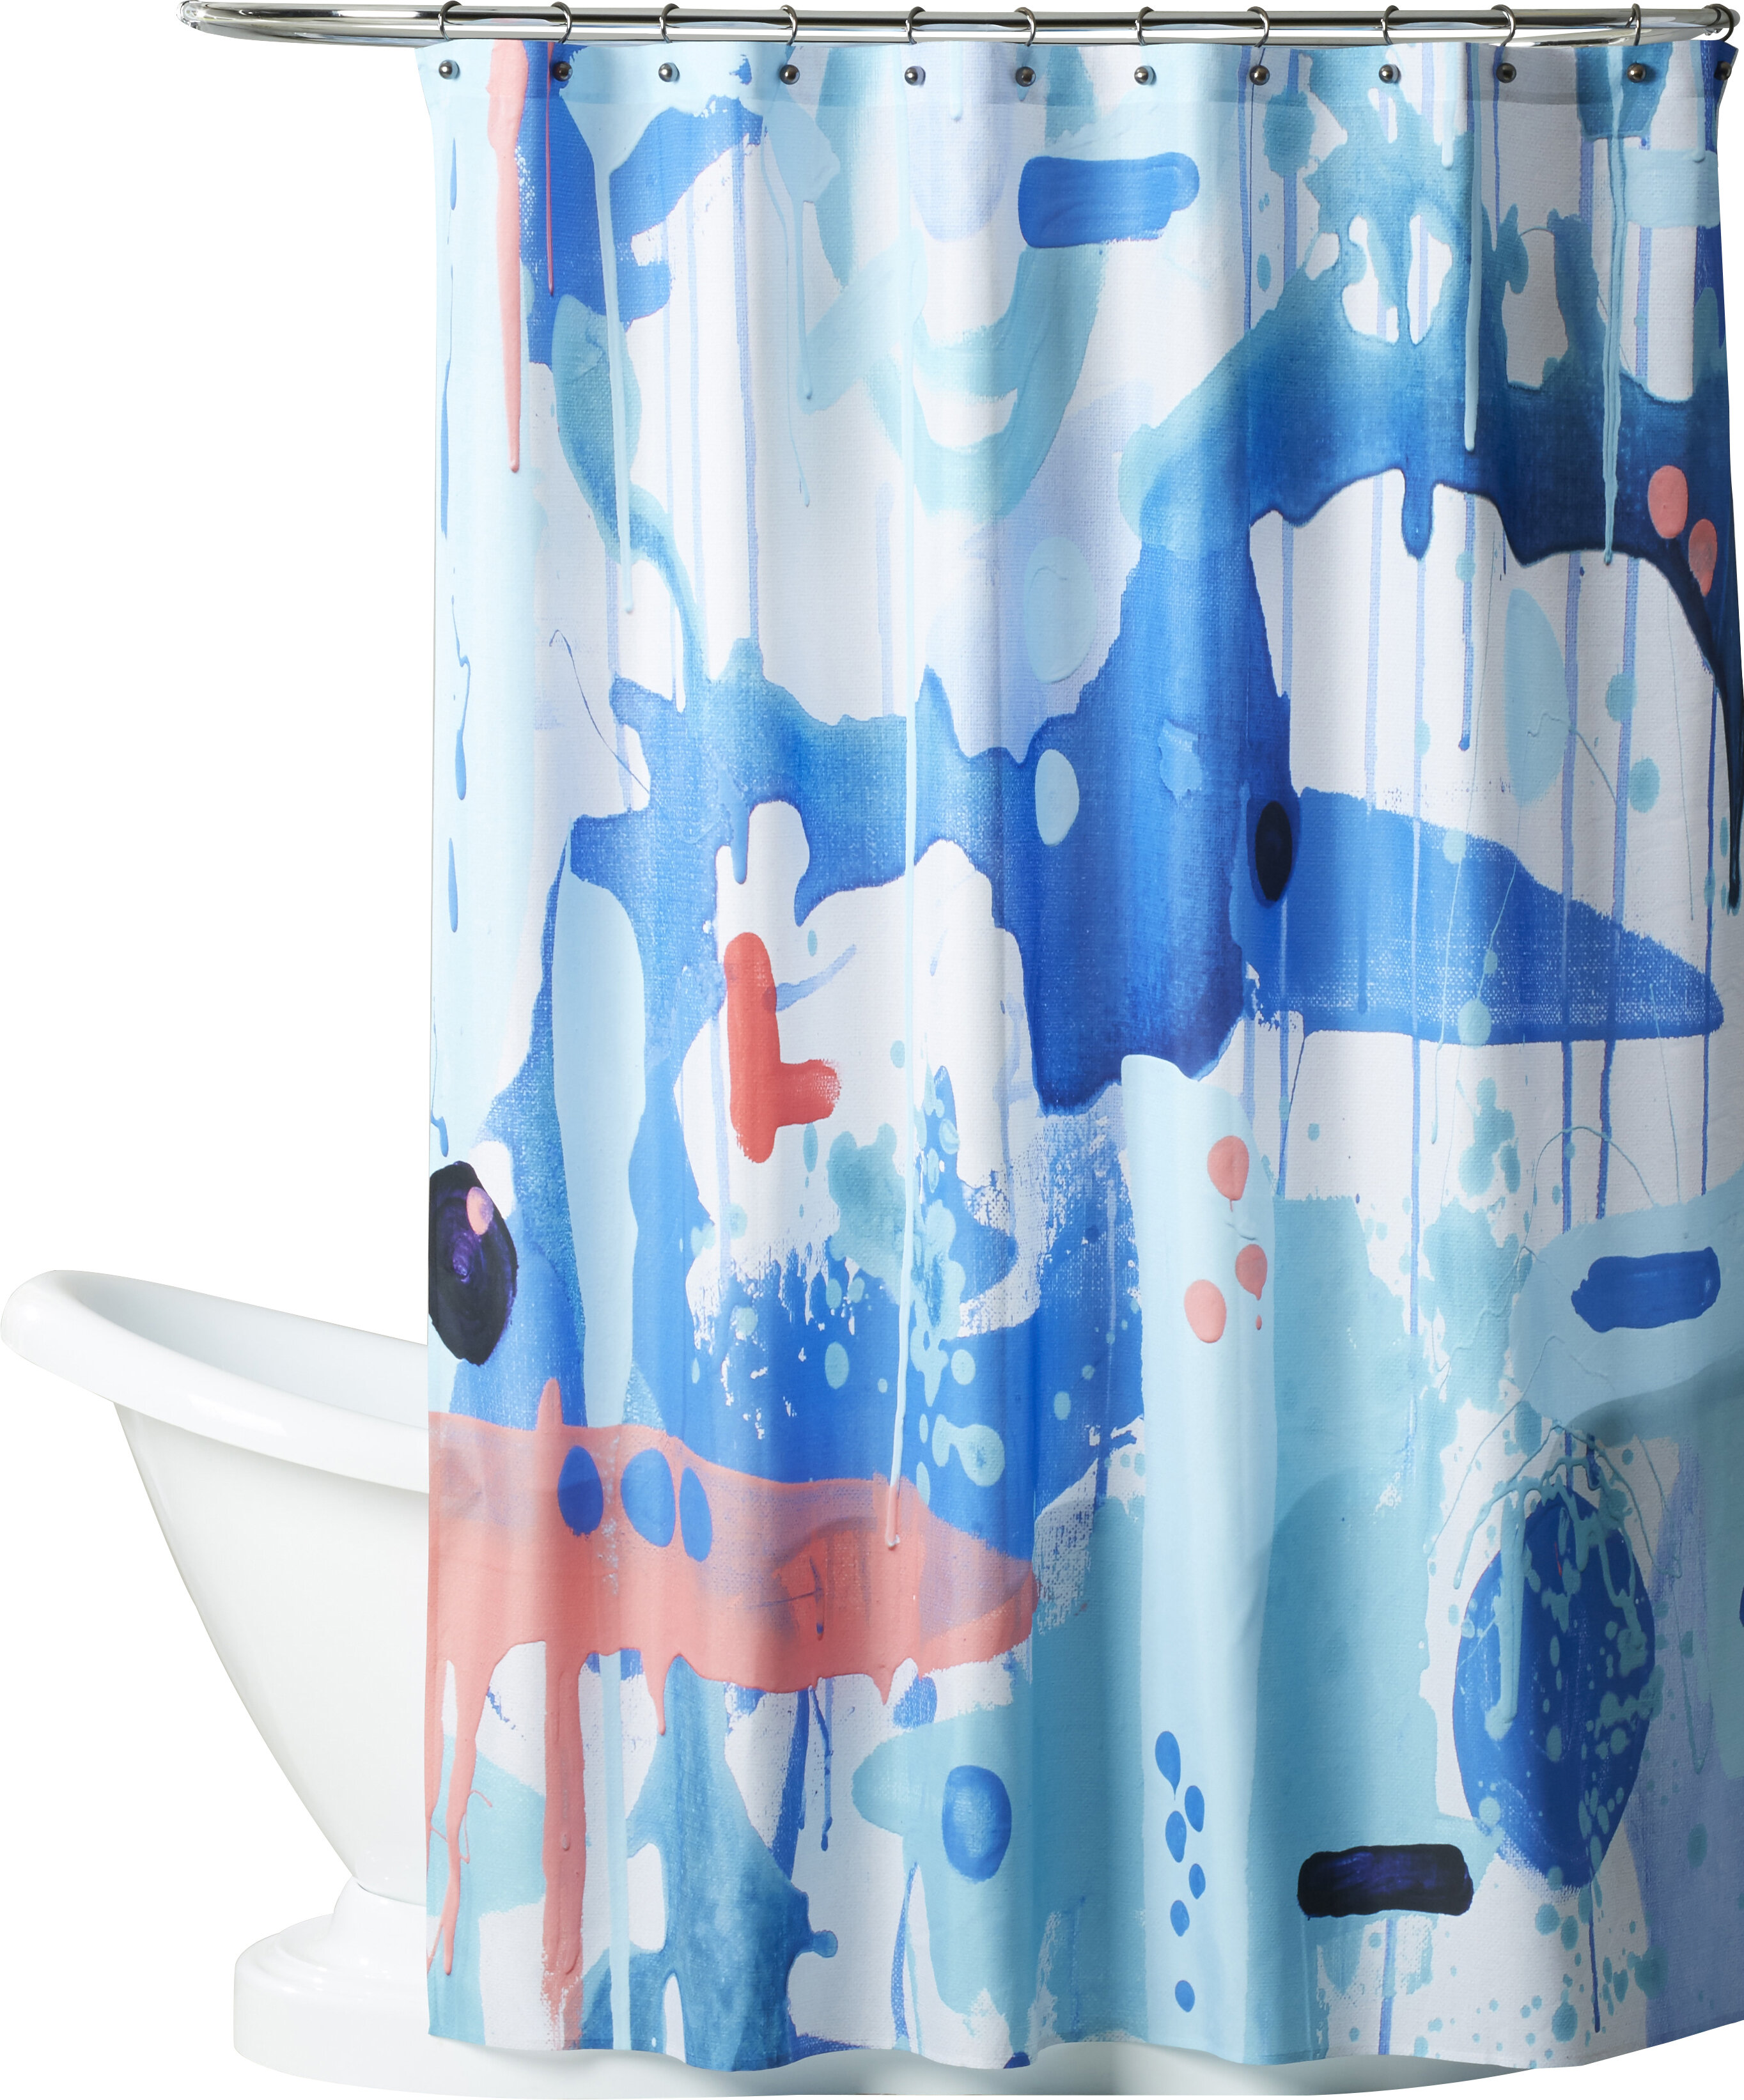 Deb McNaughton Abstract Drips Shower Curtain   AllModern